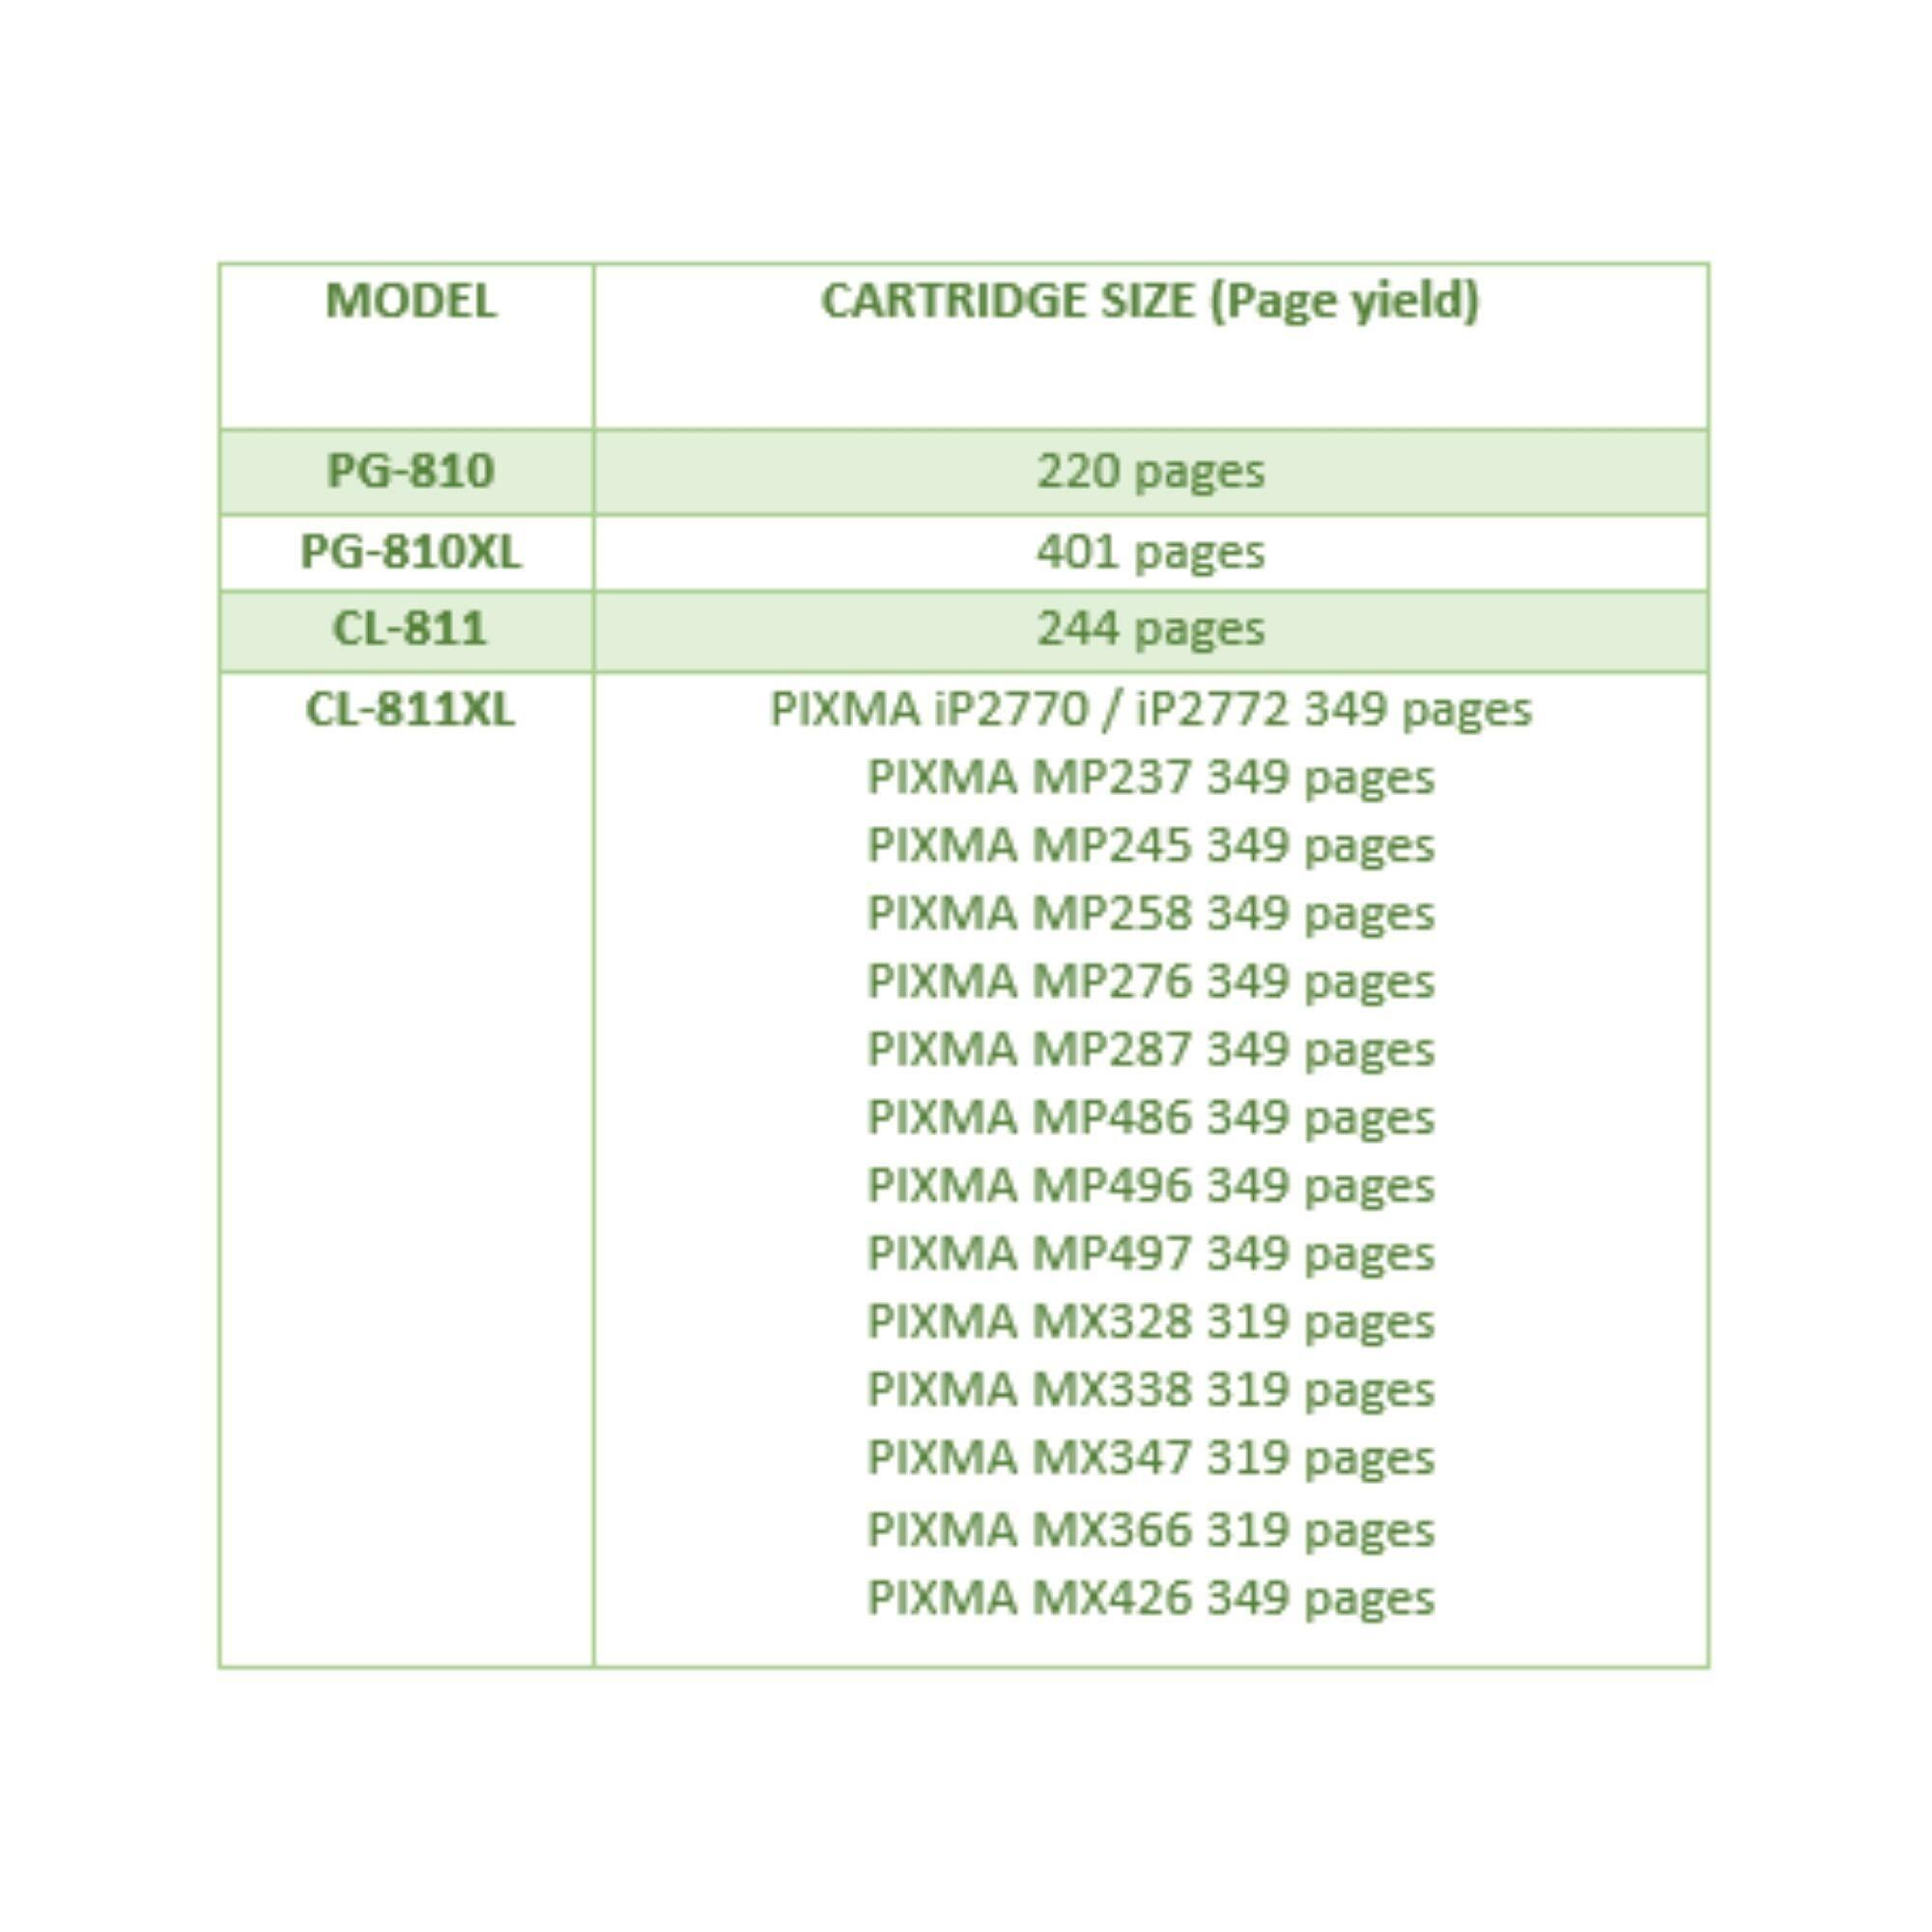 CANON CL-811 XL COLOR CARTRIDGE for iP2770/2772, MP245/237/258/287/486/496/497, MX328/338/347/357/366/416/426 Printer